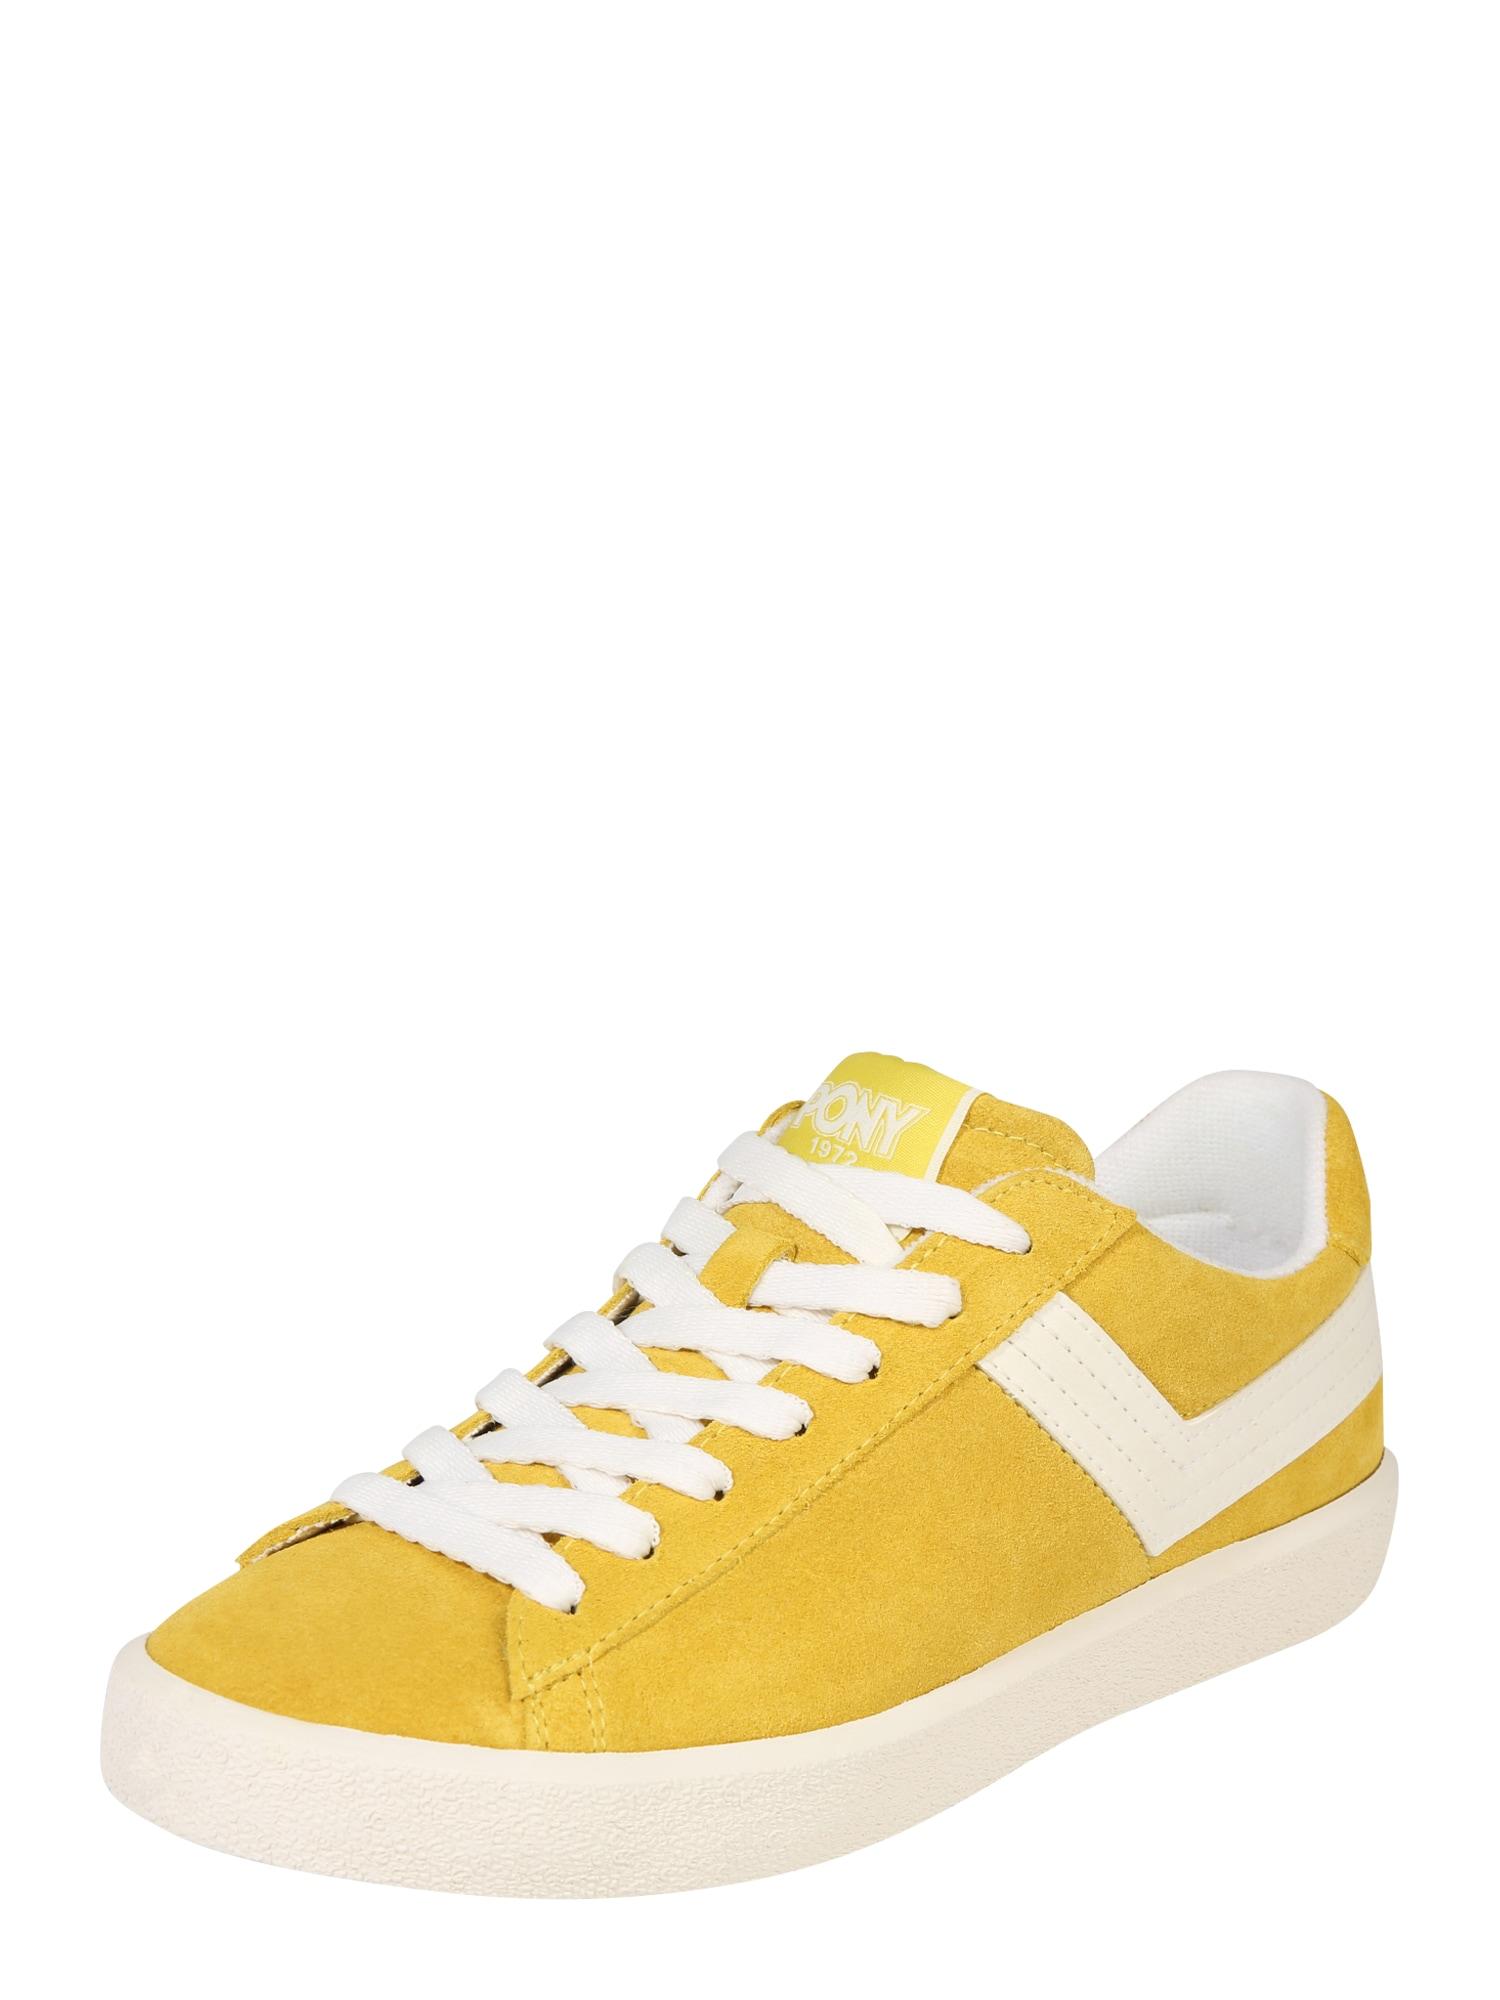 Tenisky TOP STAR žlutá bílá PONY